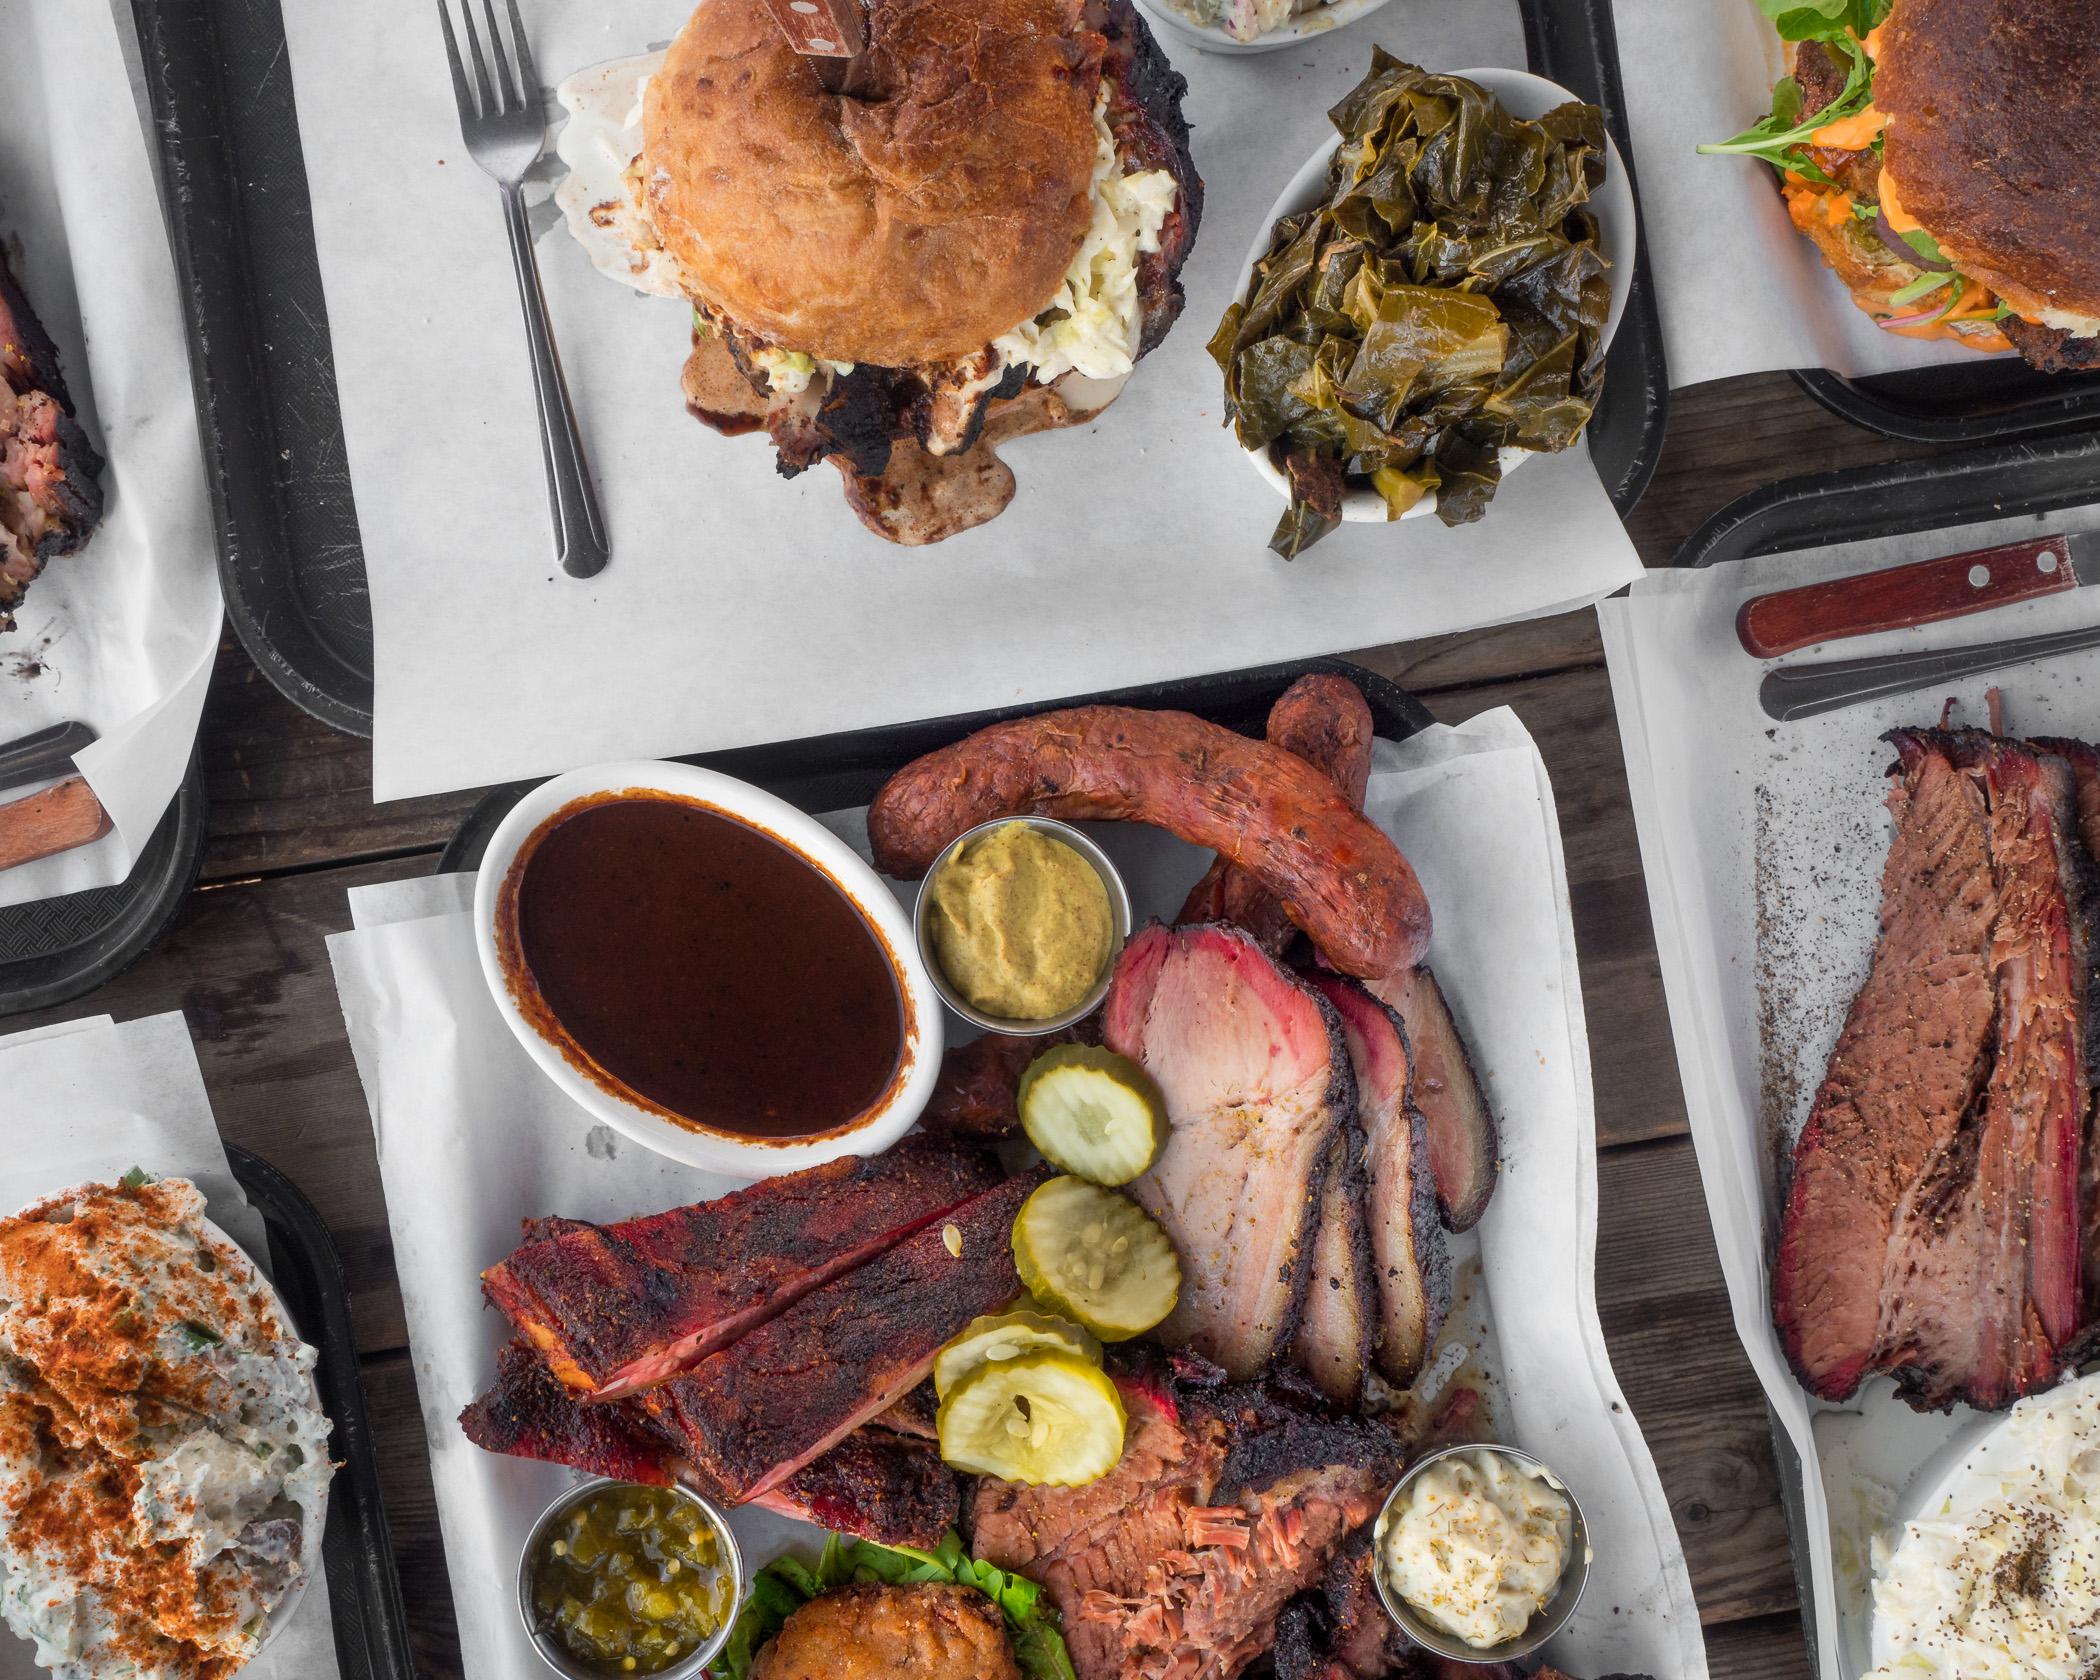 Jeremy Pawlowski Portland Texas Austin Amarillo Food Photographer Photography Fare Photo Studios bbq barbecue barbeque feast